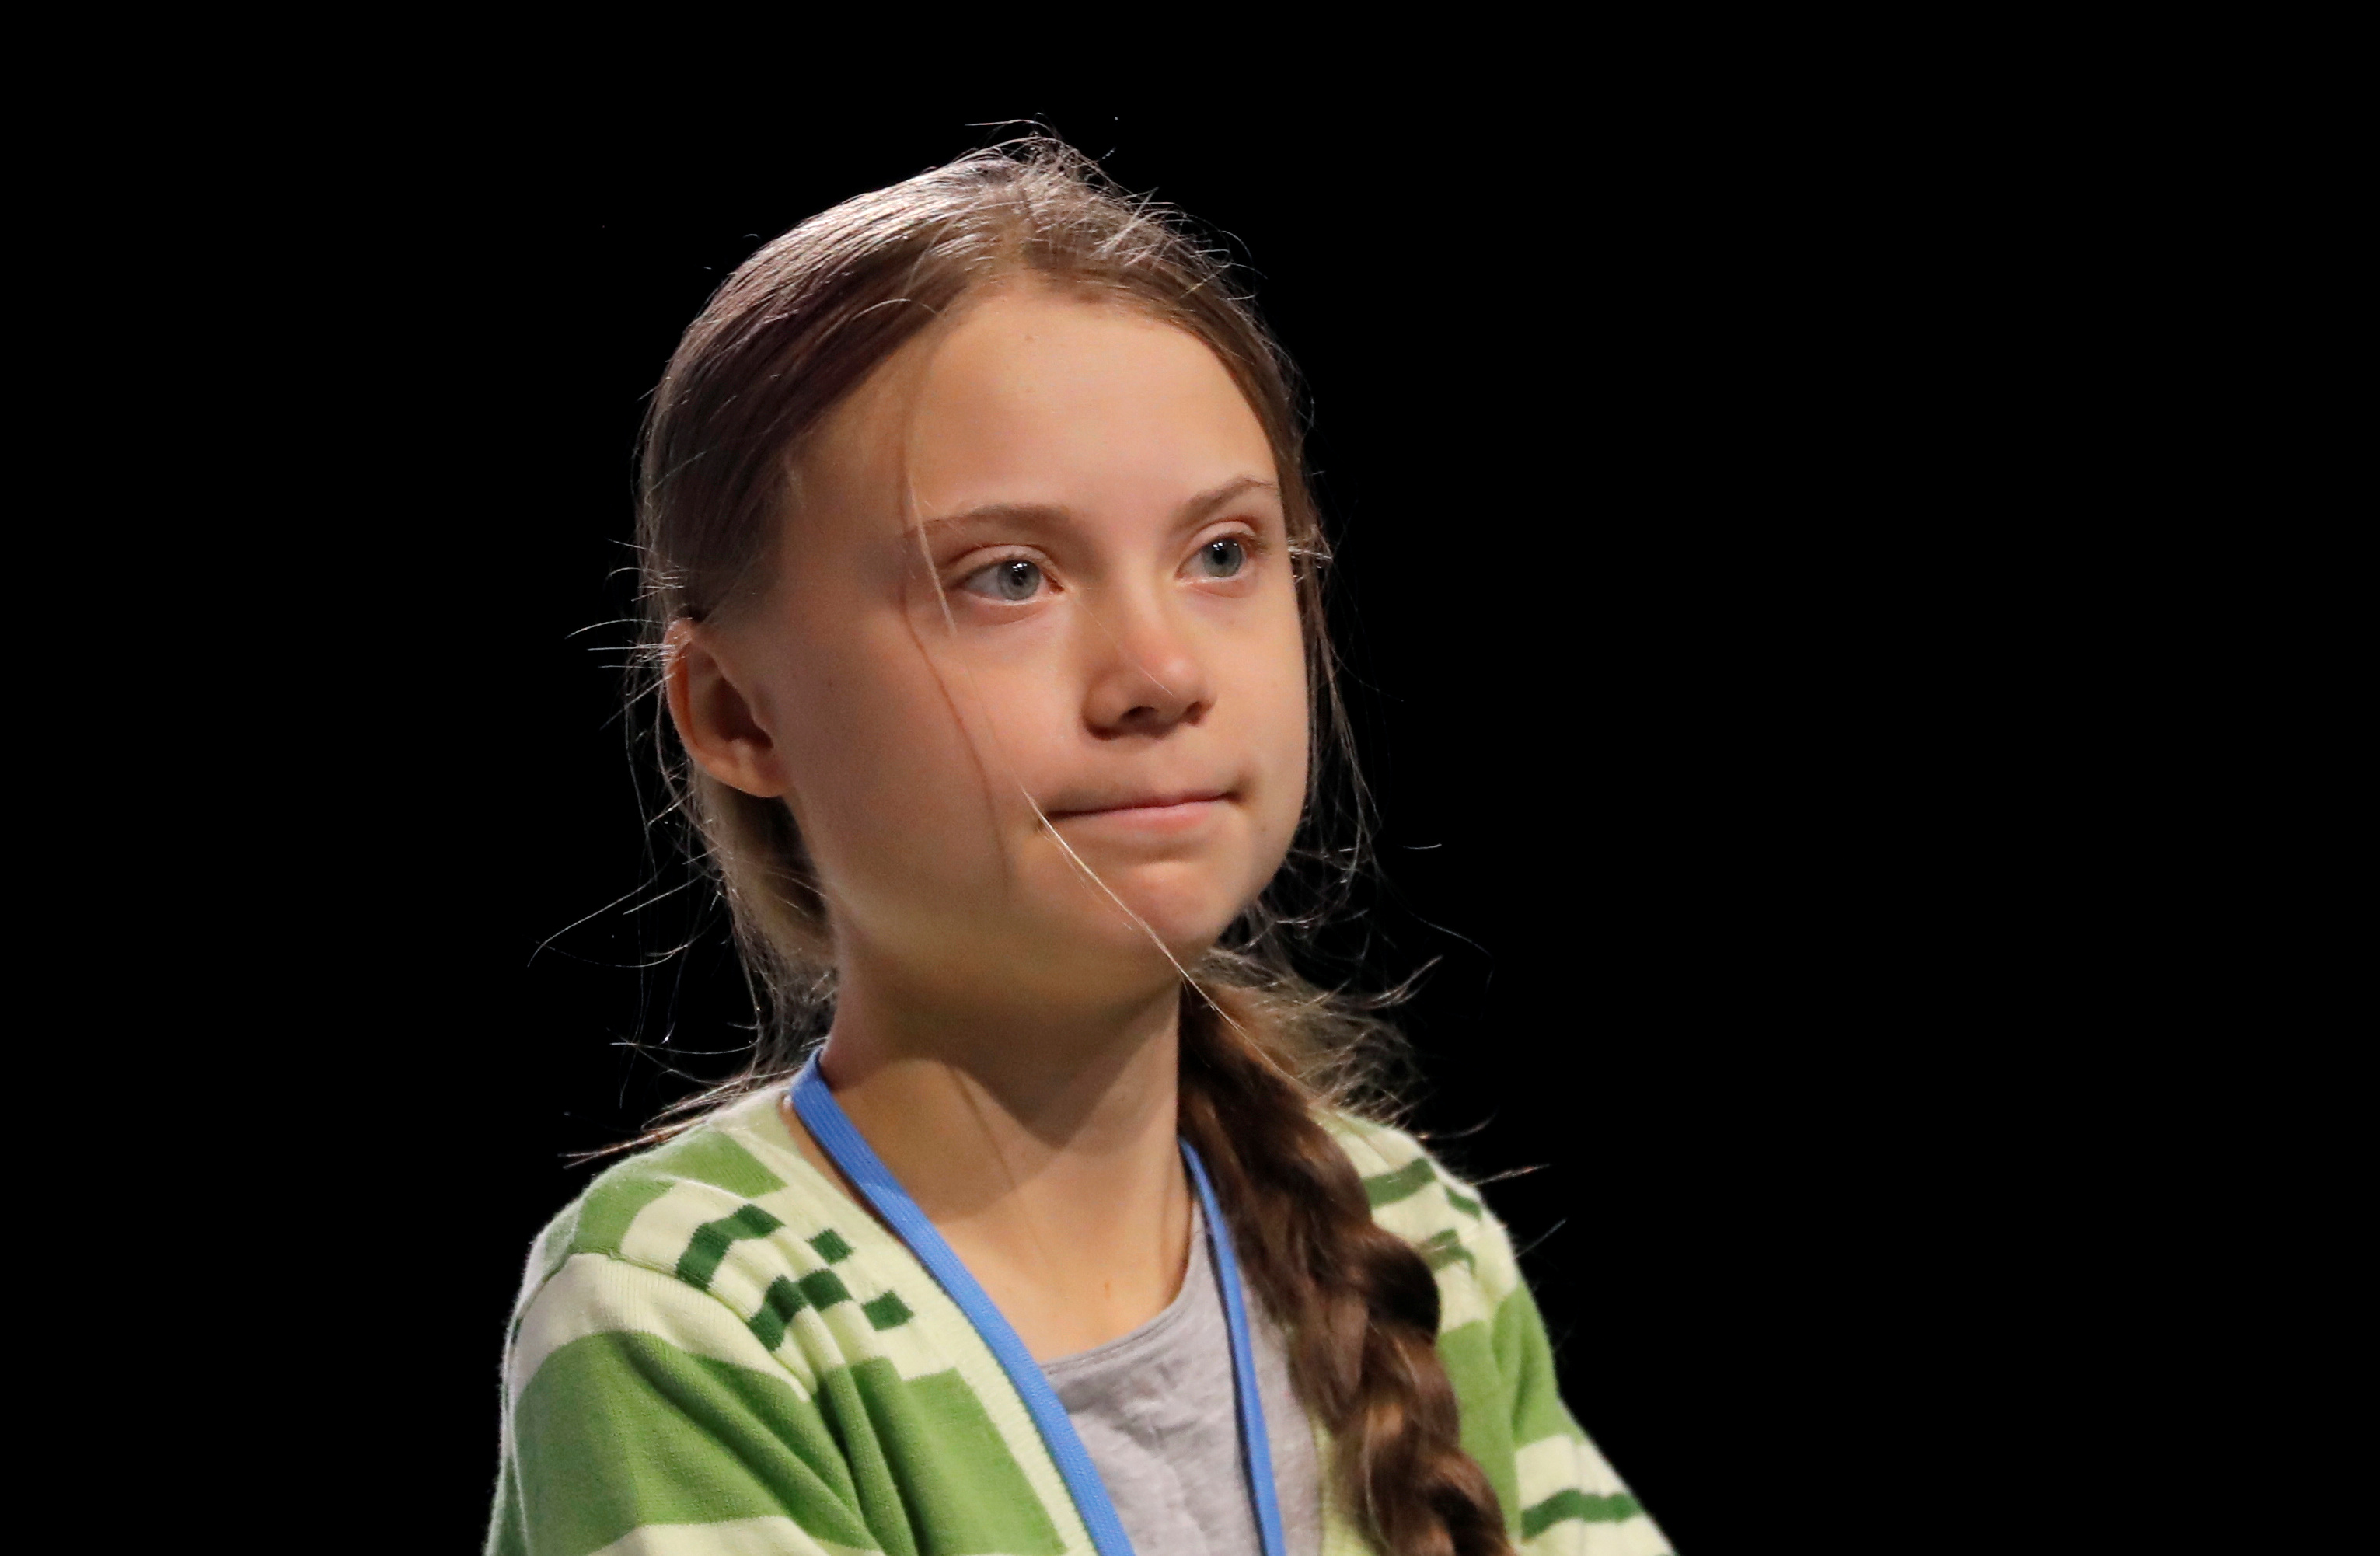 Trump conseille à Greta Thunberg de se